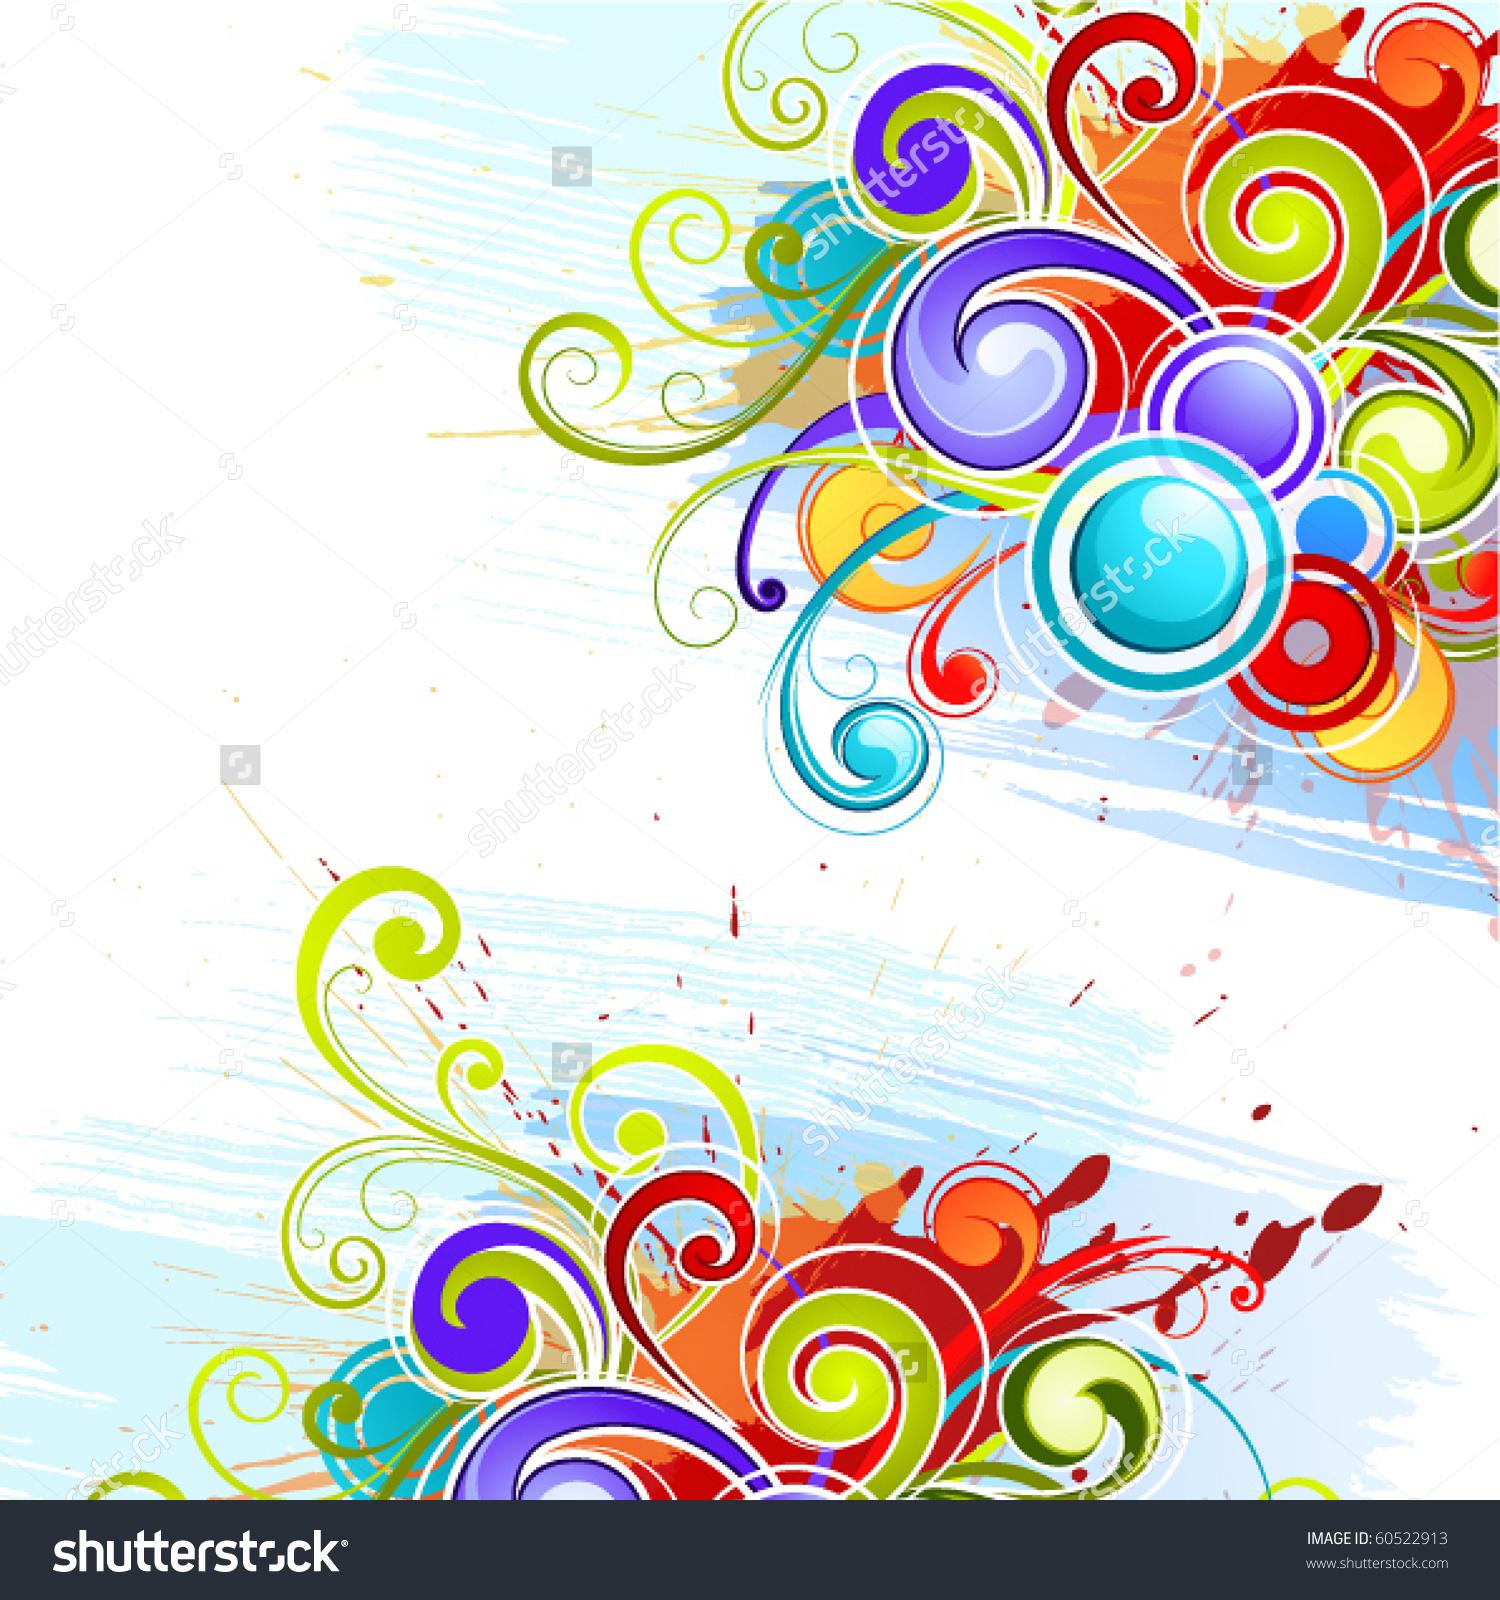 Colour Composition Stock Vector Illustration 60522913 : Shutterstock.